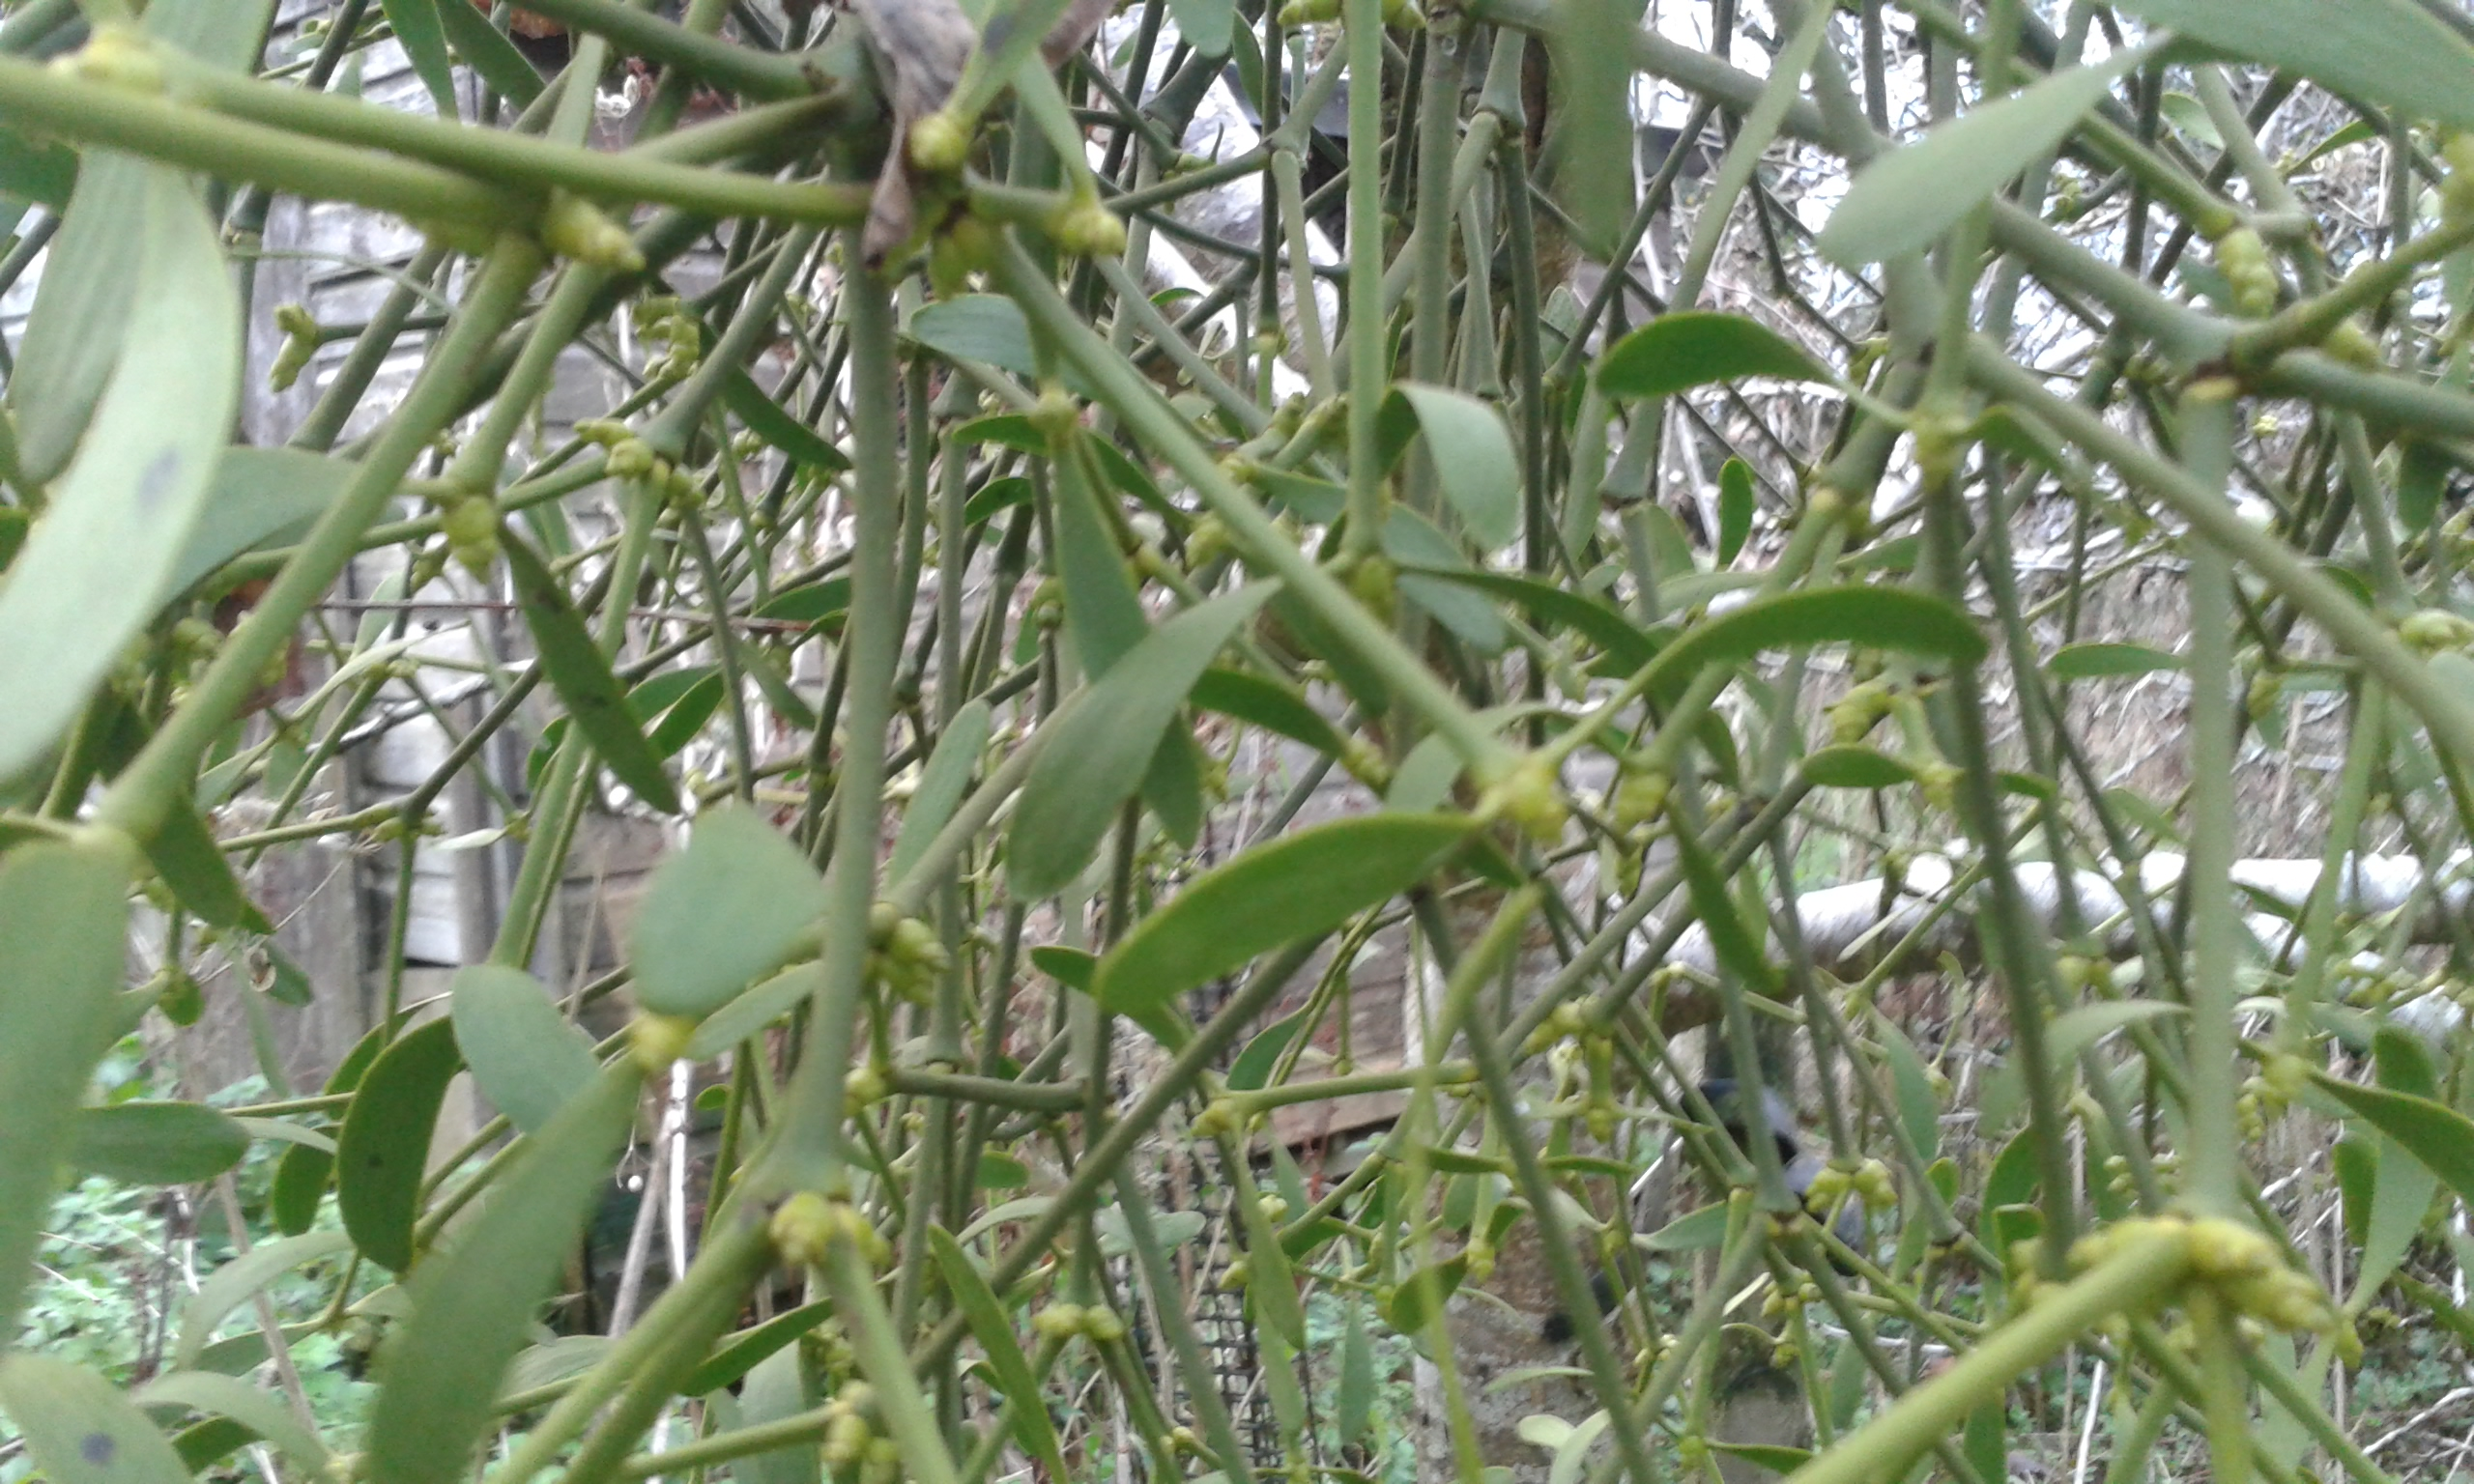 Mistletoe at Orchard Keepers Cottage